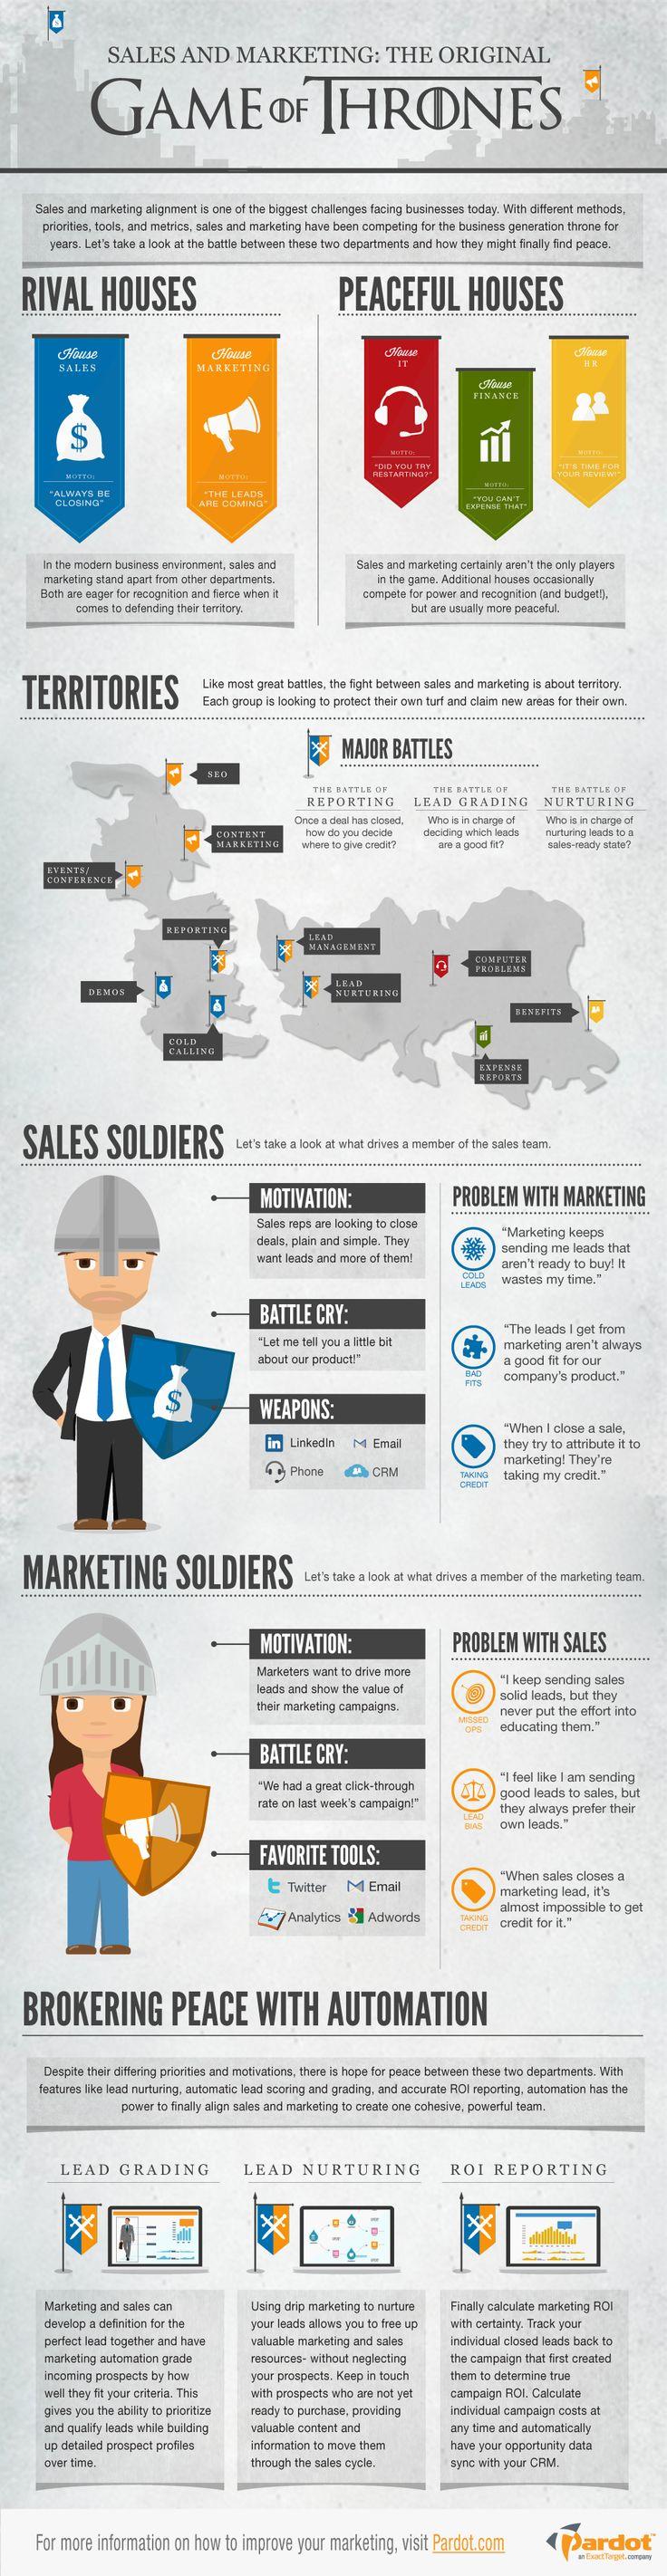 INFOGRAPHIC: Sales vs Marketing - The Original Game of Thrones